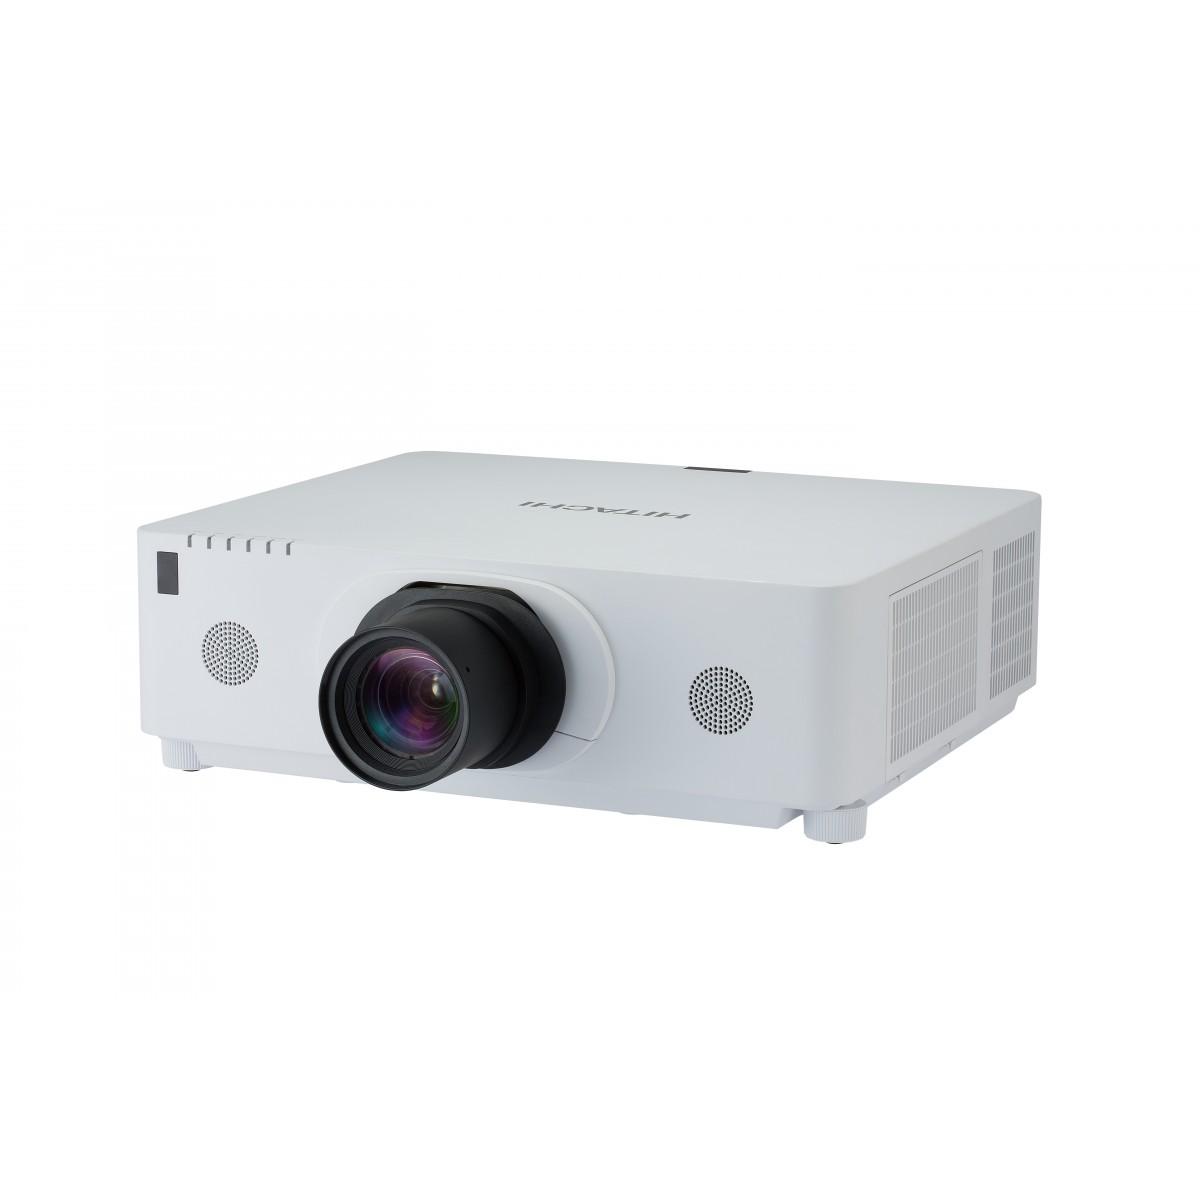 Hitachi, CPWX8650W, installation, 6500, Lumens, WXGA, Projector, No, Lens, HDBaseT,